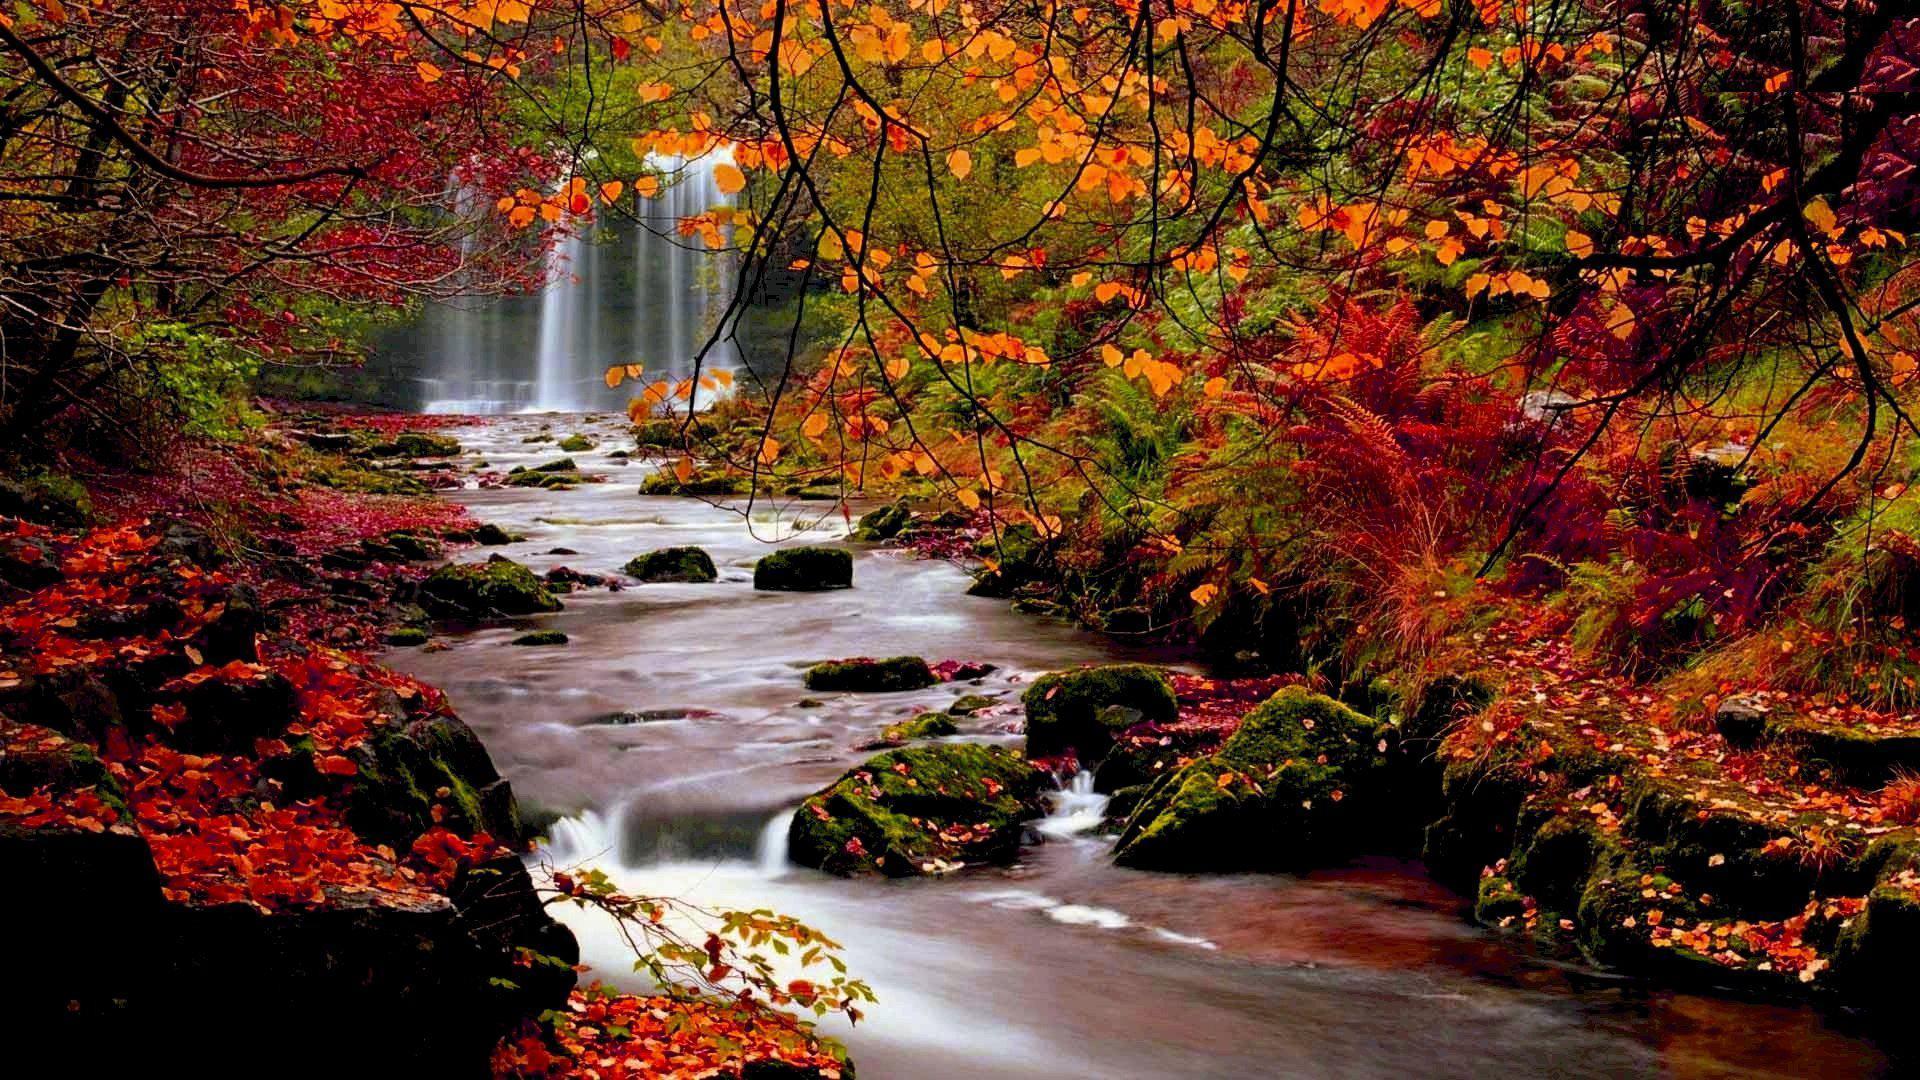 Autumn Trees Nature Landscape Leaf Leaves Desktop 1920x1080